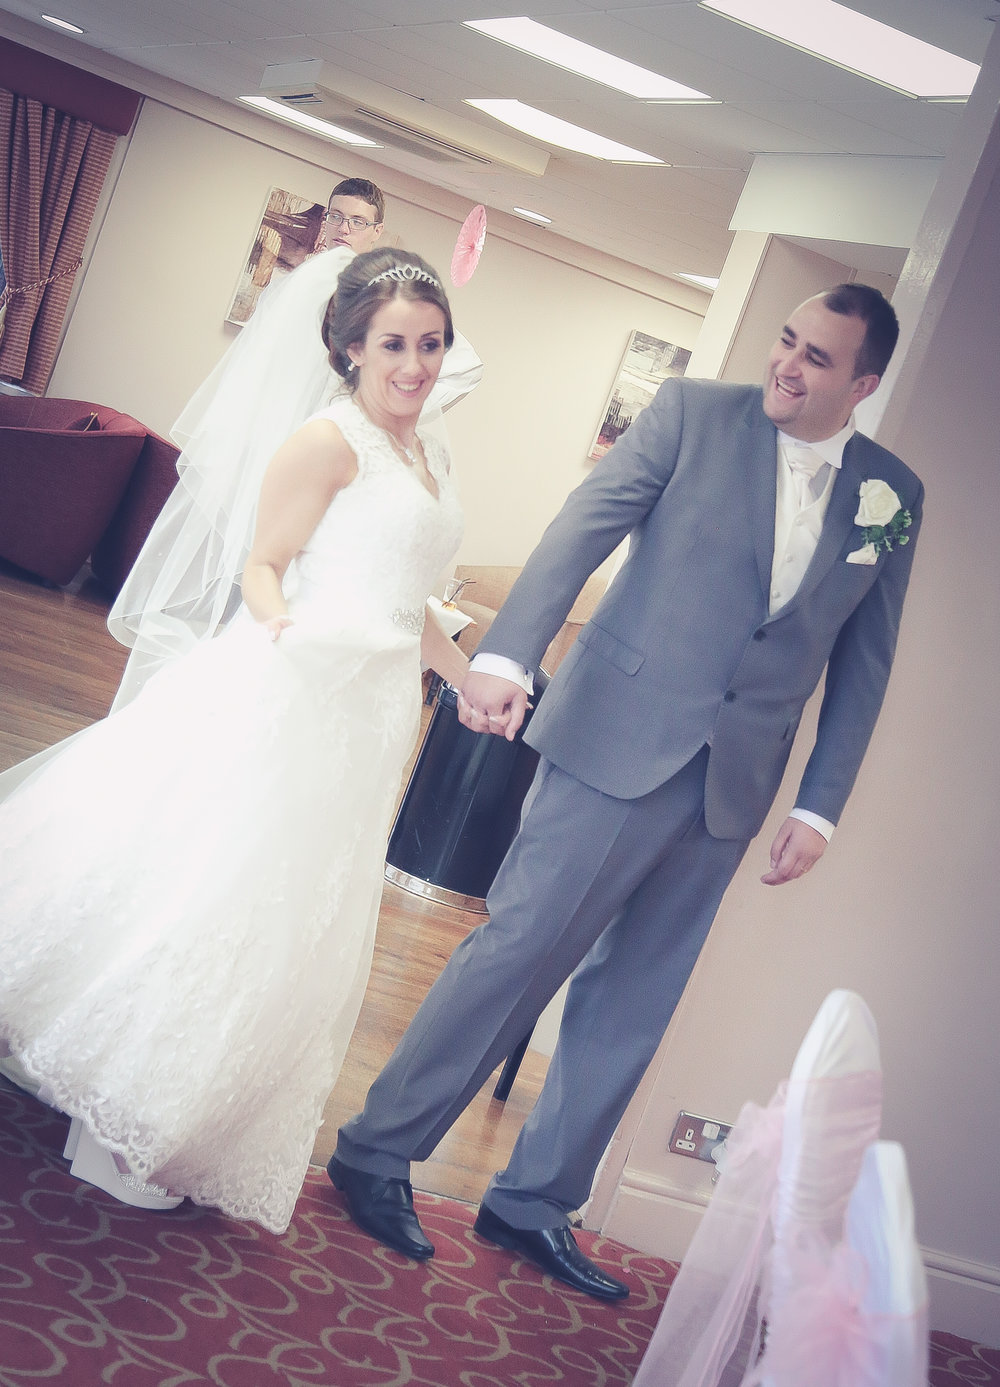 Wedding photography runcorn-1-27.jpg